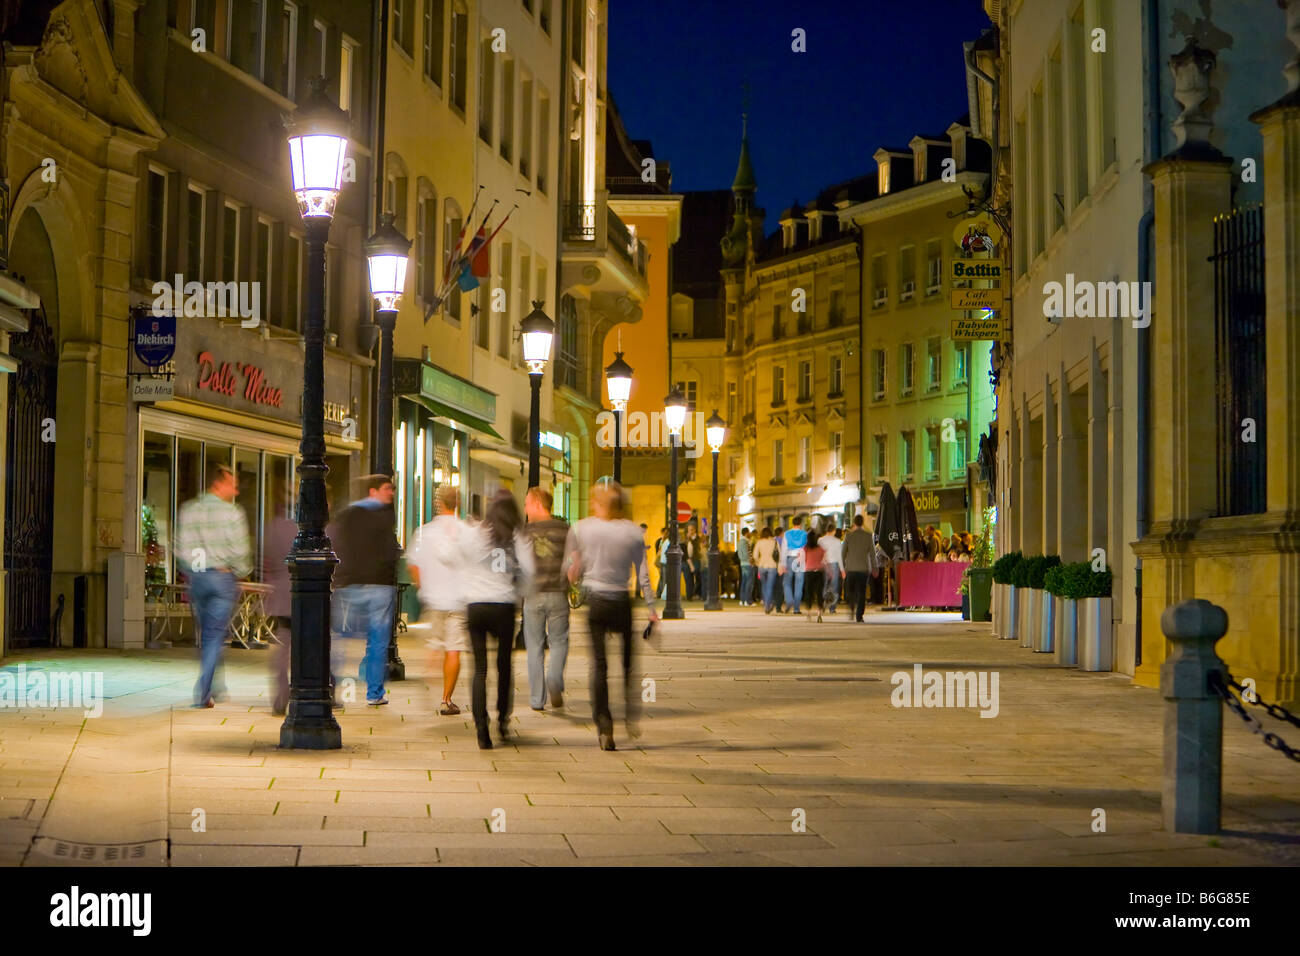 Luxembourg dating scene